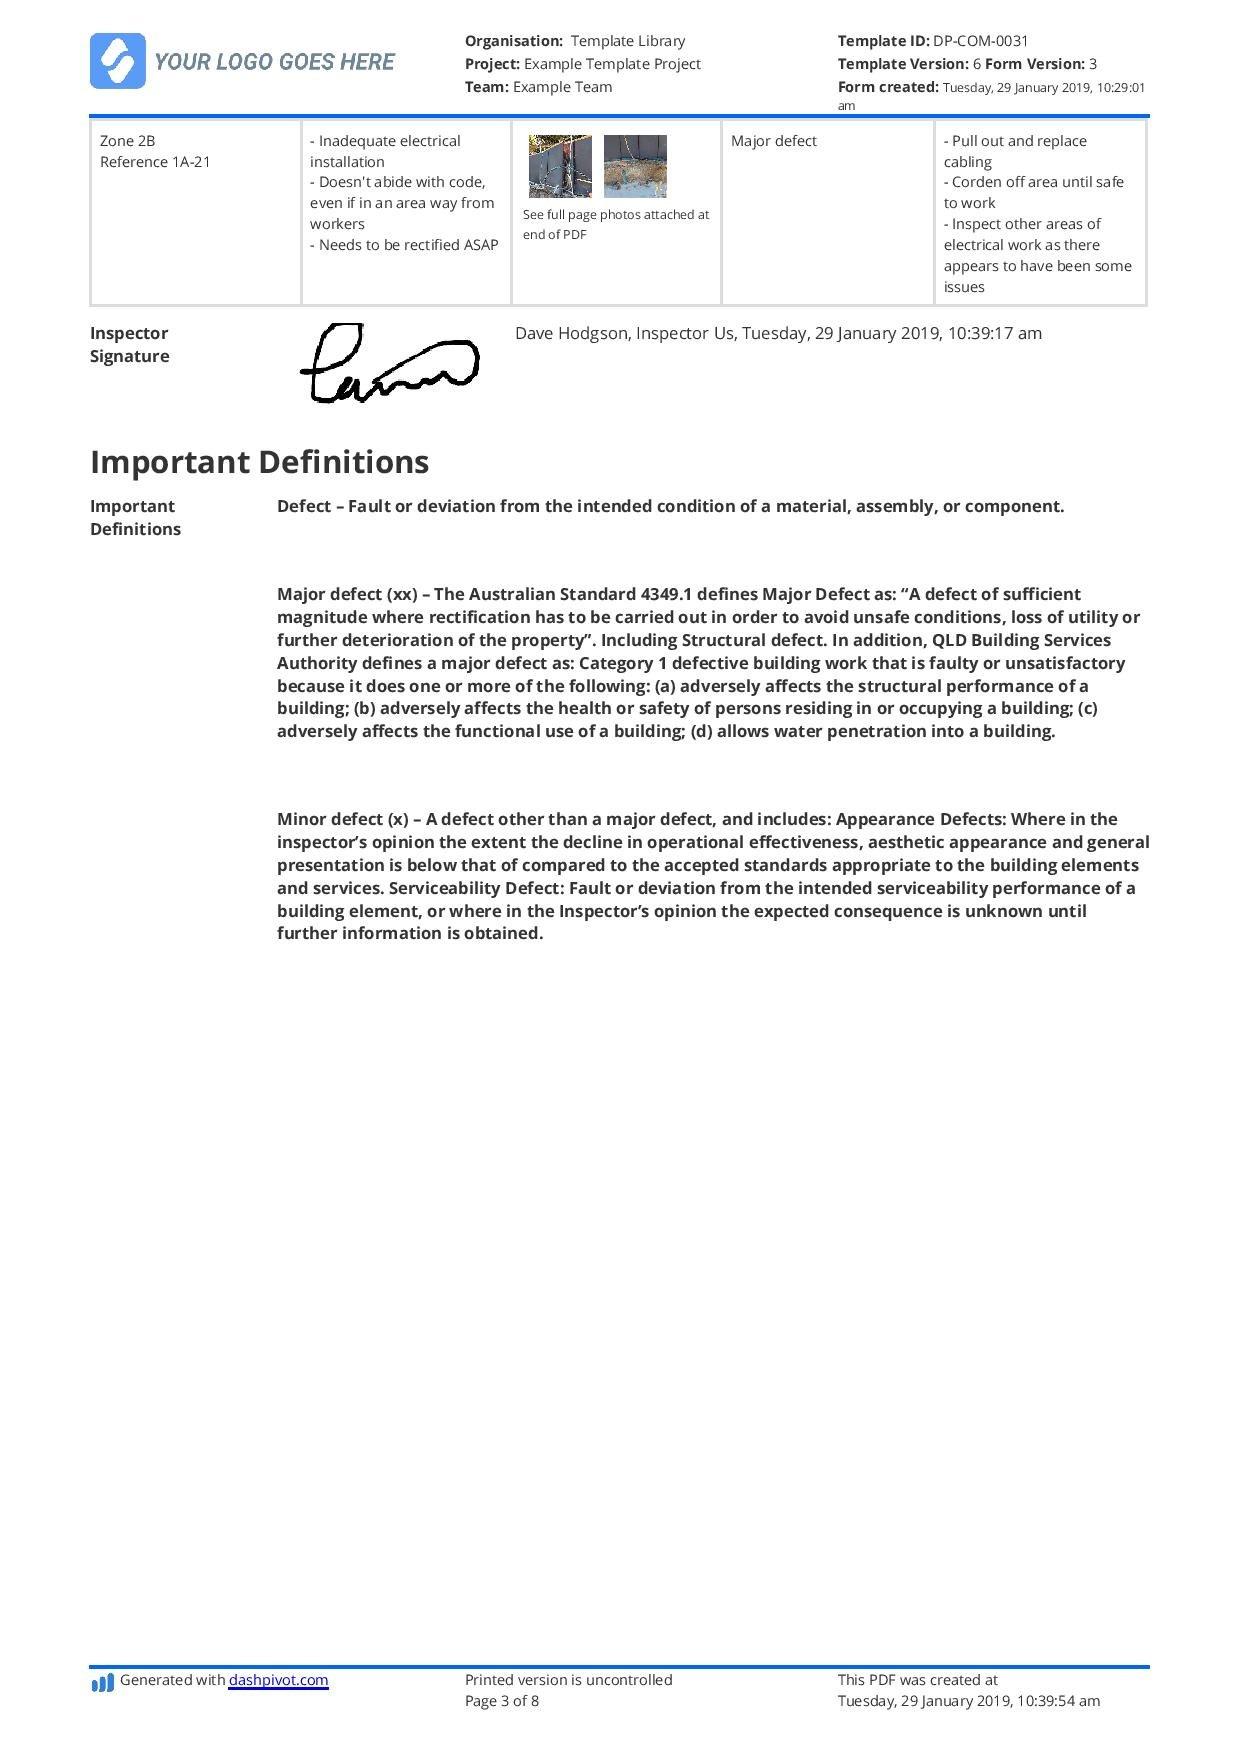 Construction Expert Witness Report Example And Editable Template Regarding Expert Witness Report Template